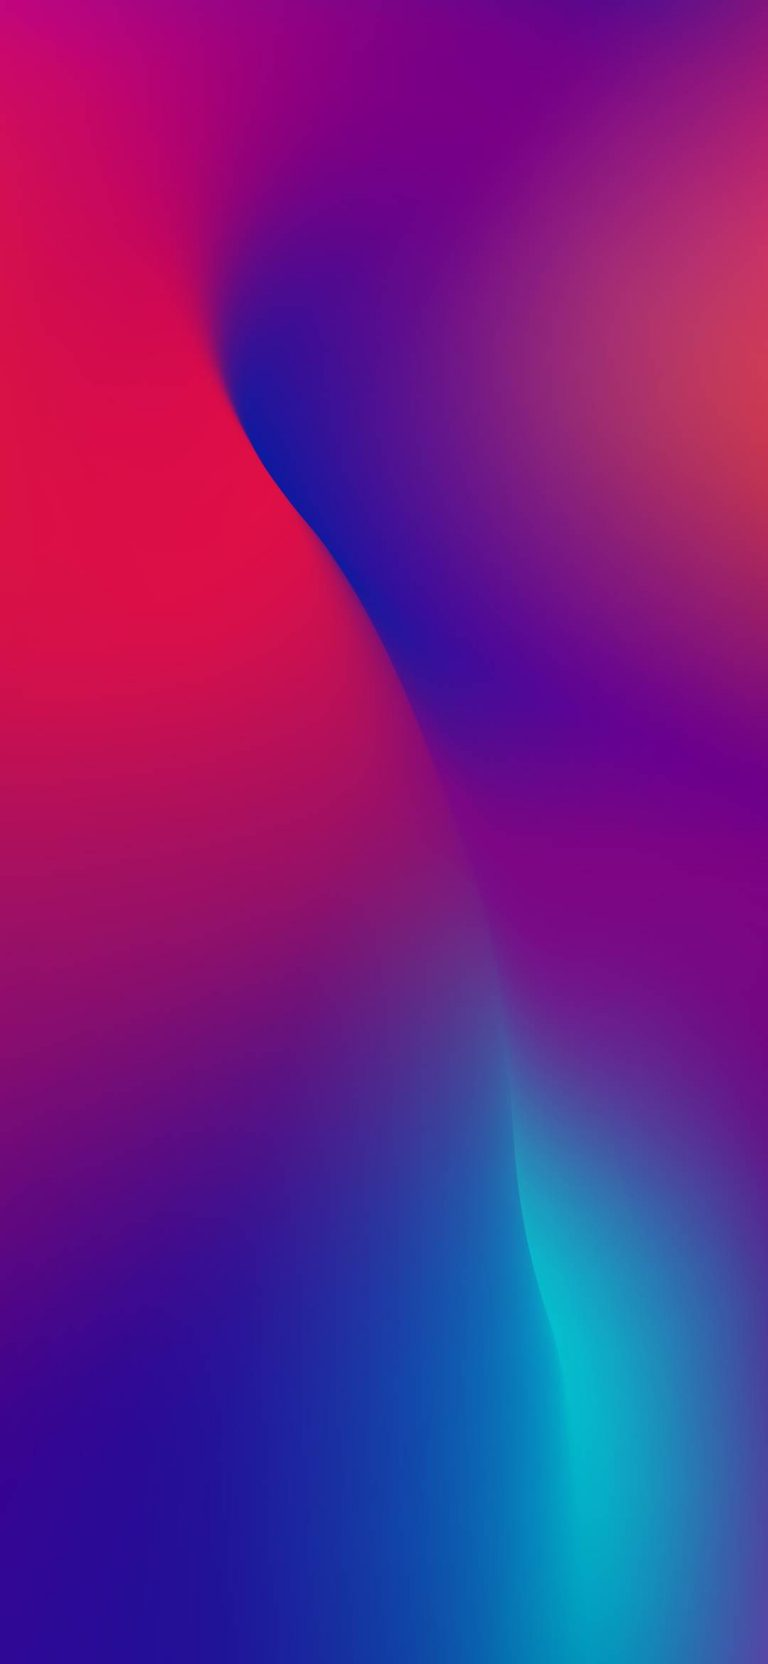 Oppo R17 Stock Wallpaper 02 1080x2340 768x1664